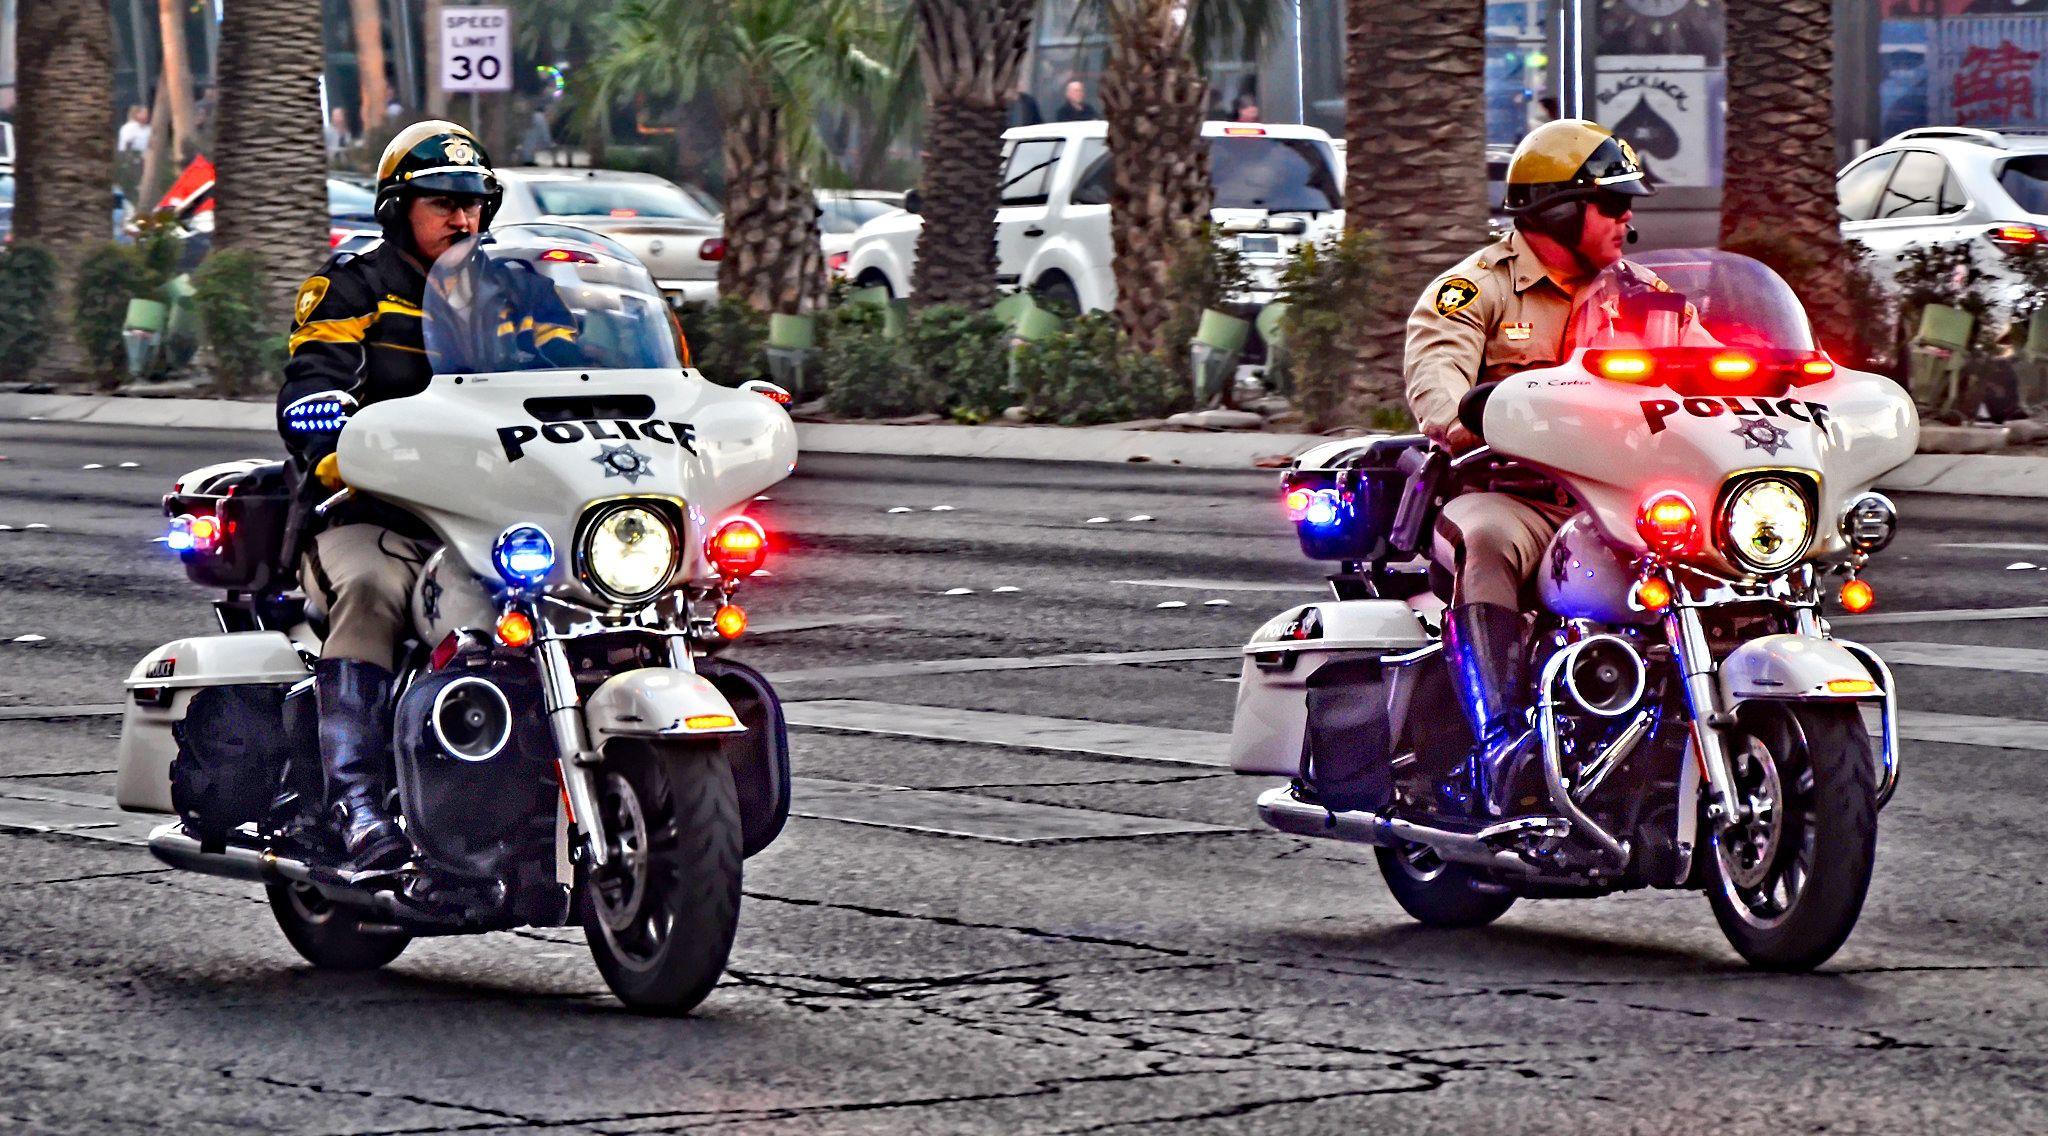 Las Vegas Metropolitan Police Emergency Vehicles Police Las Vegas